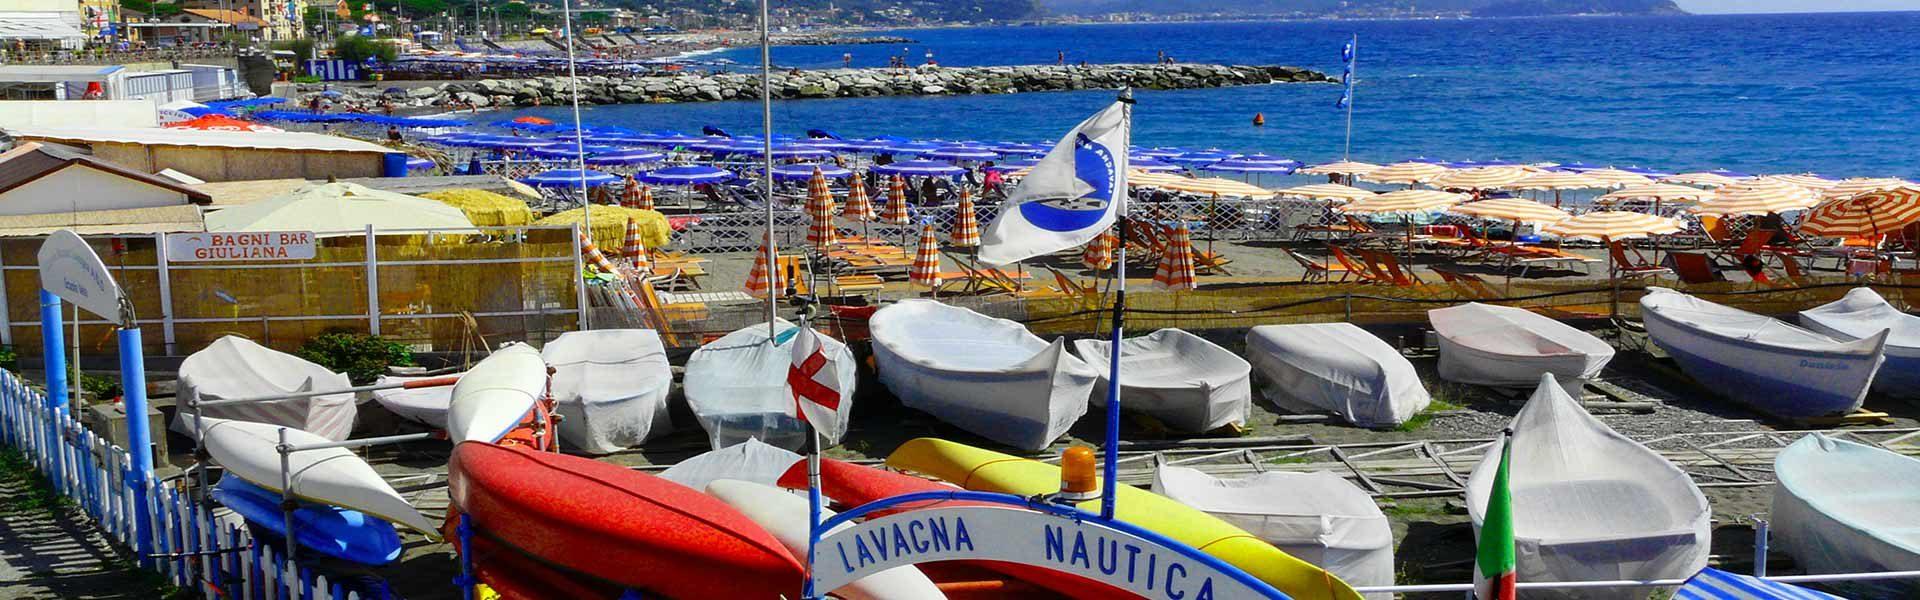 spiaggia_golfotigullio_hoteltirrenocavi